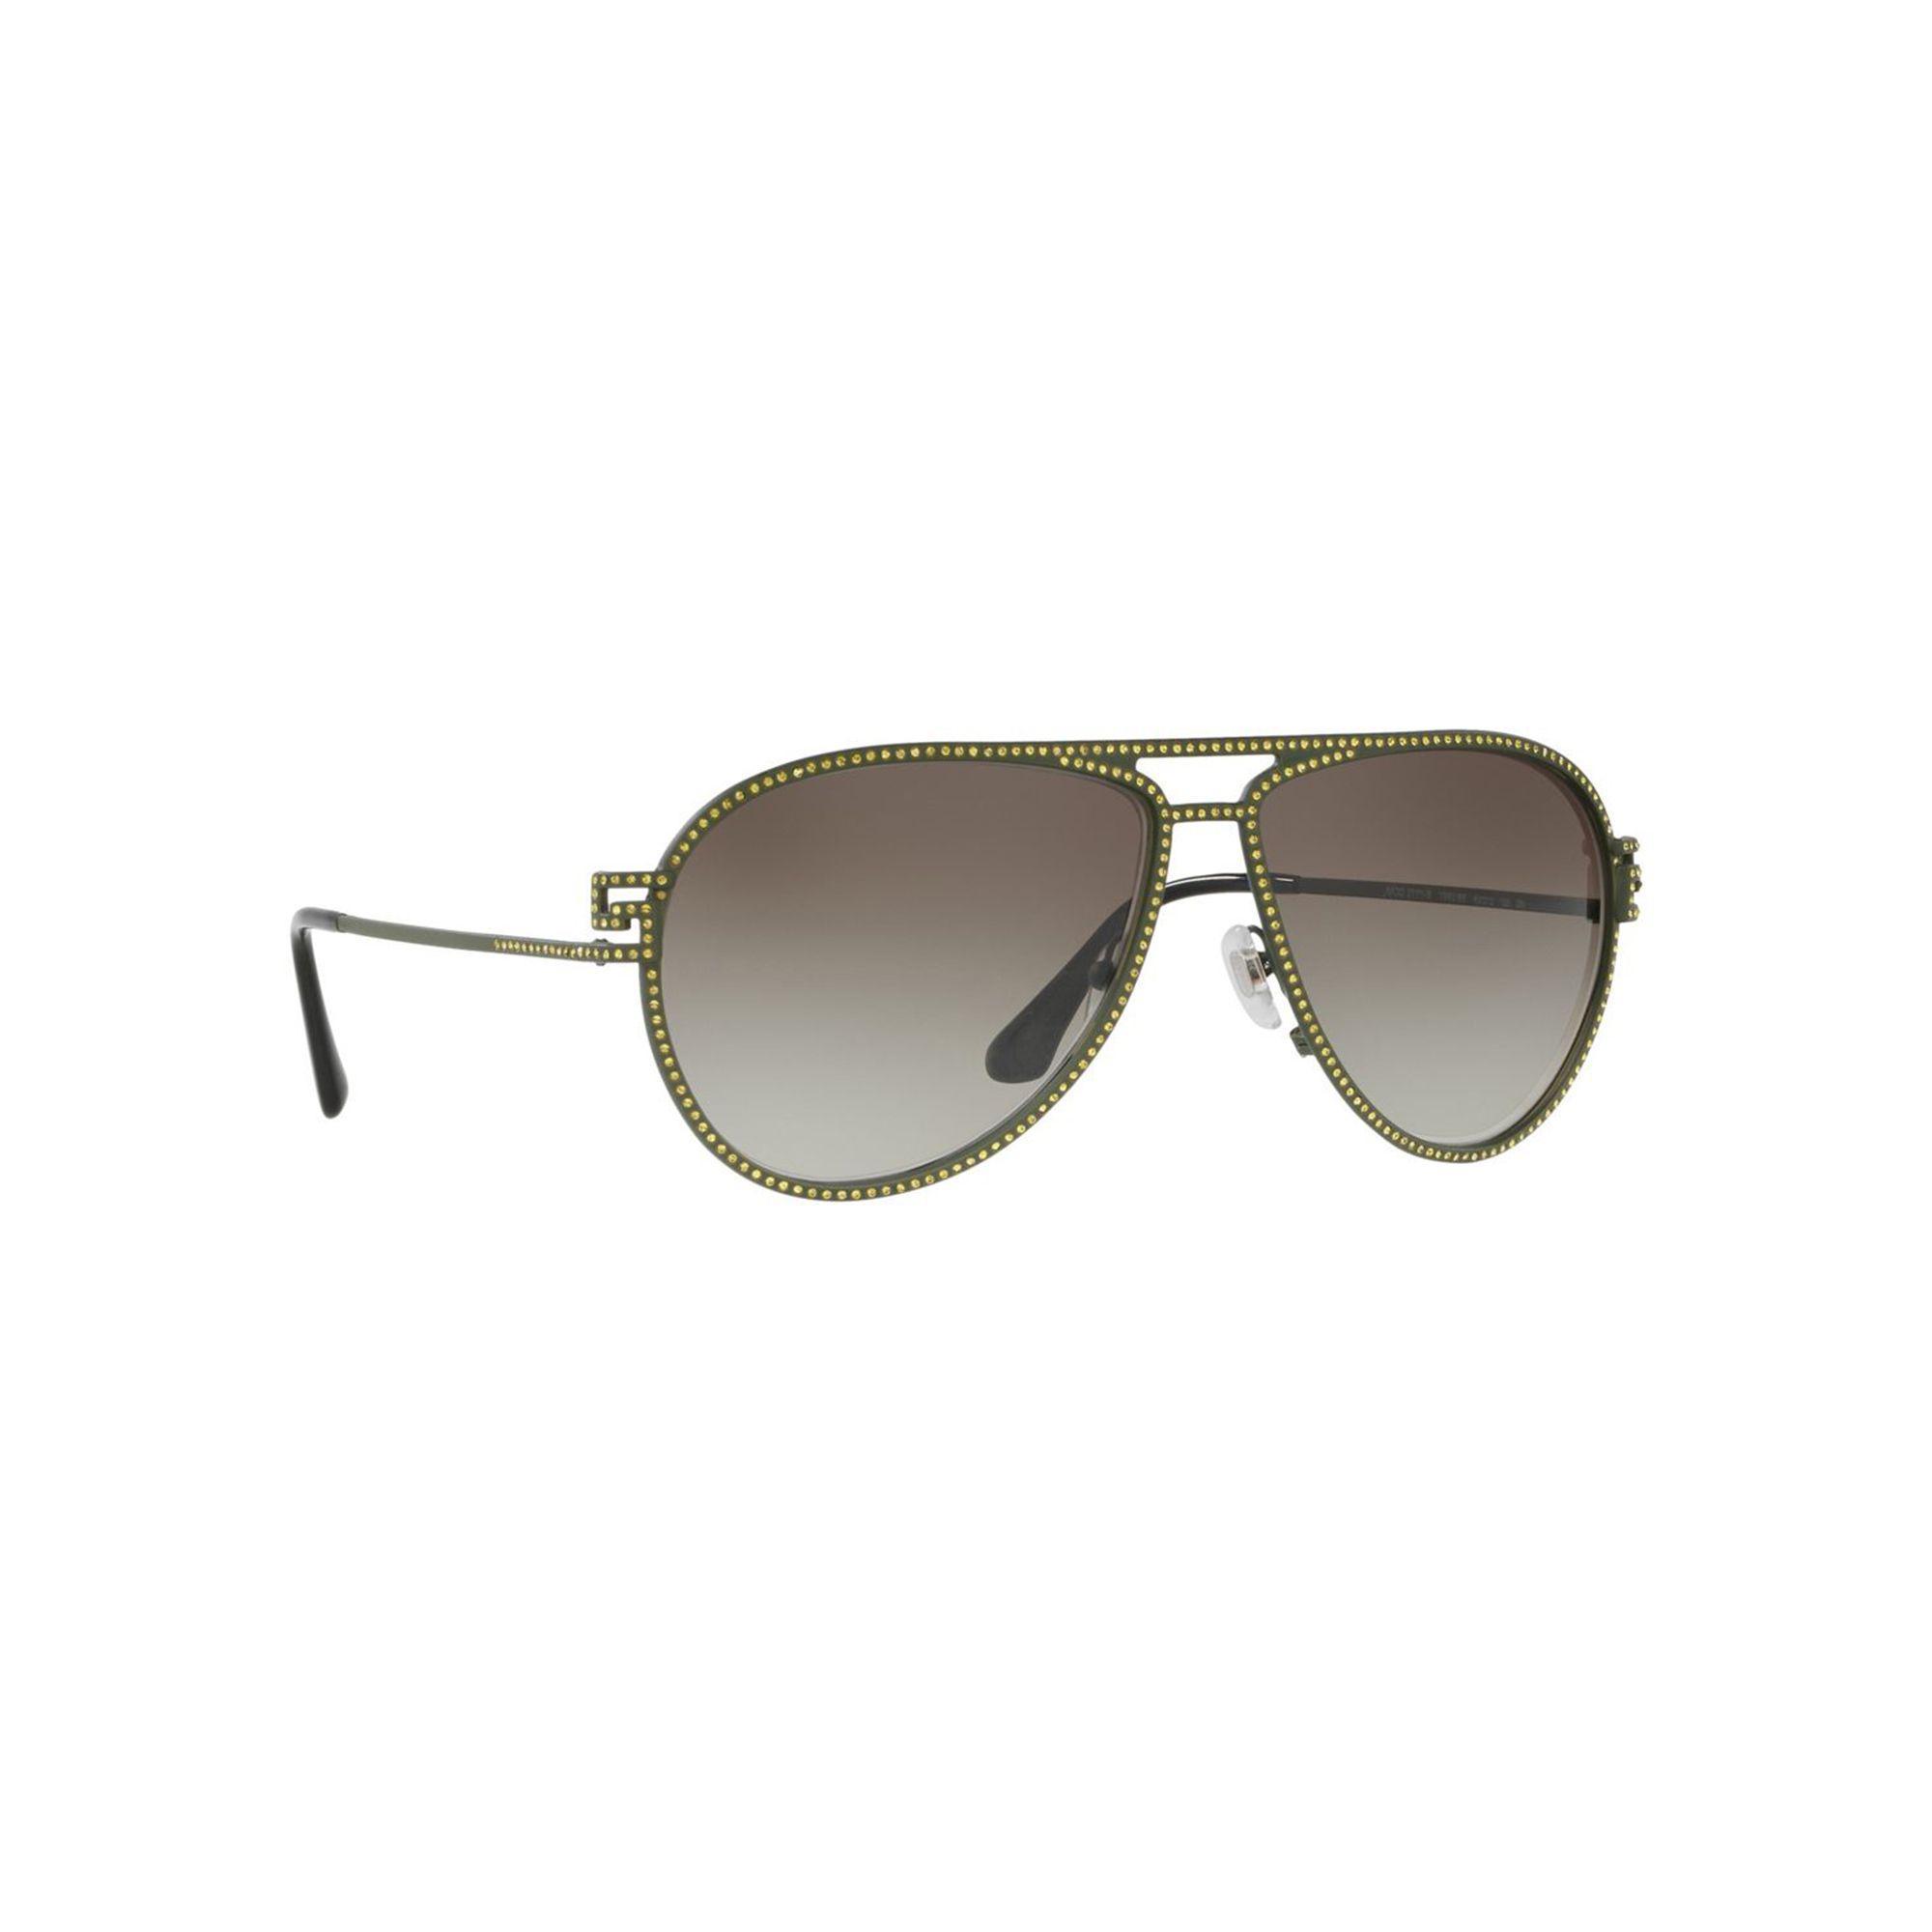 9444d44a5a32 Sunglasses Green Matte Pilot In Lyst Ve2171b Versace wIBxdpI